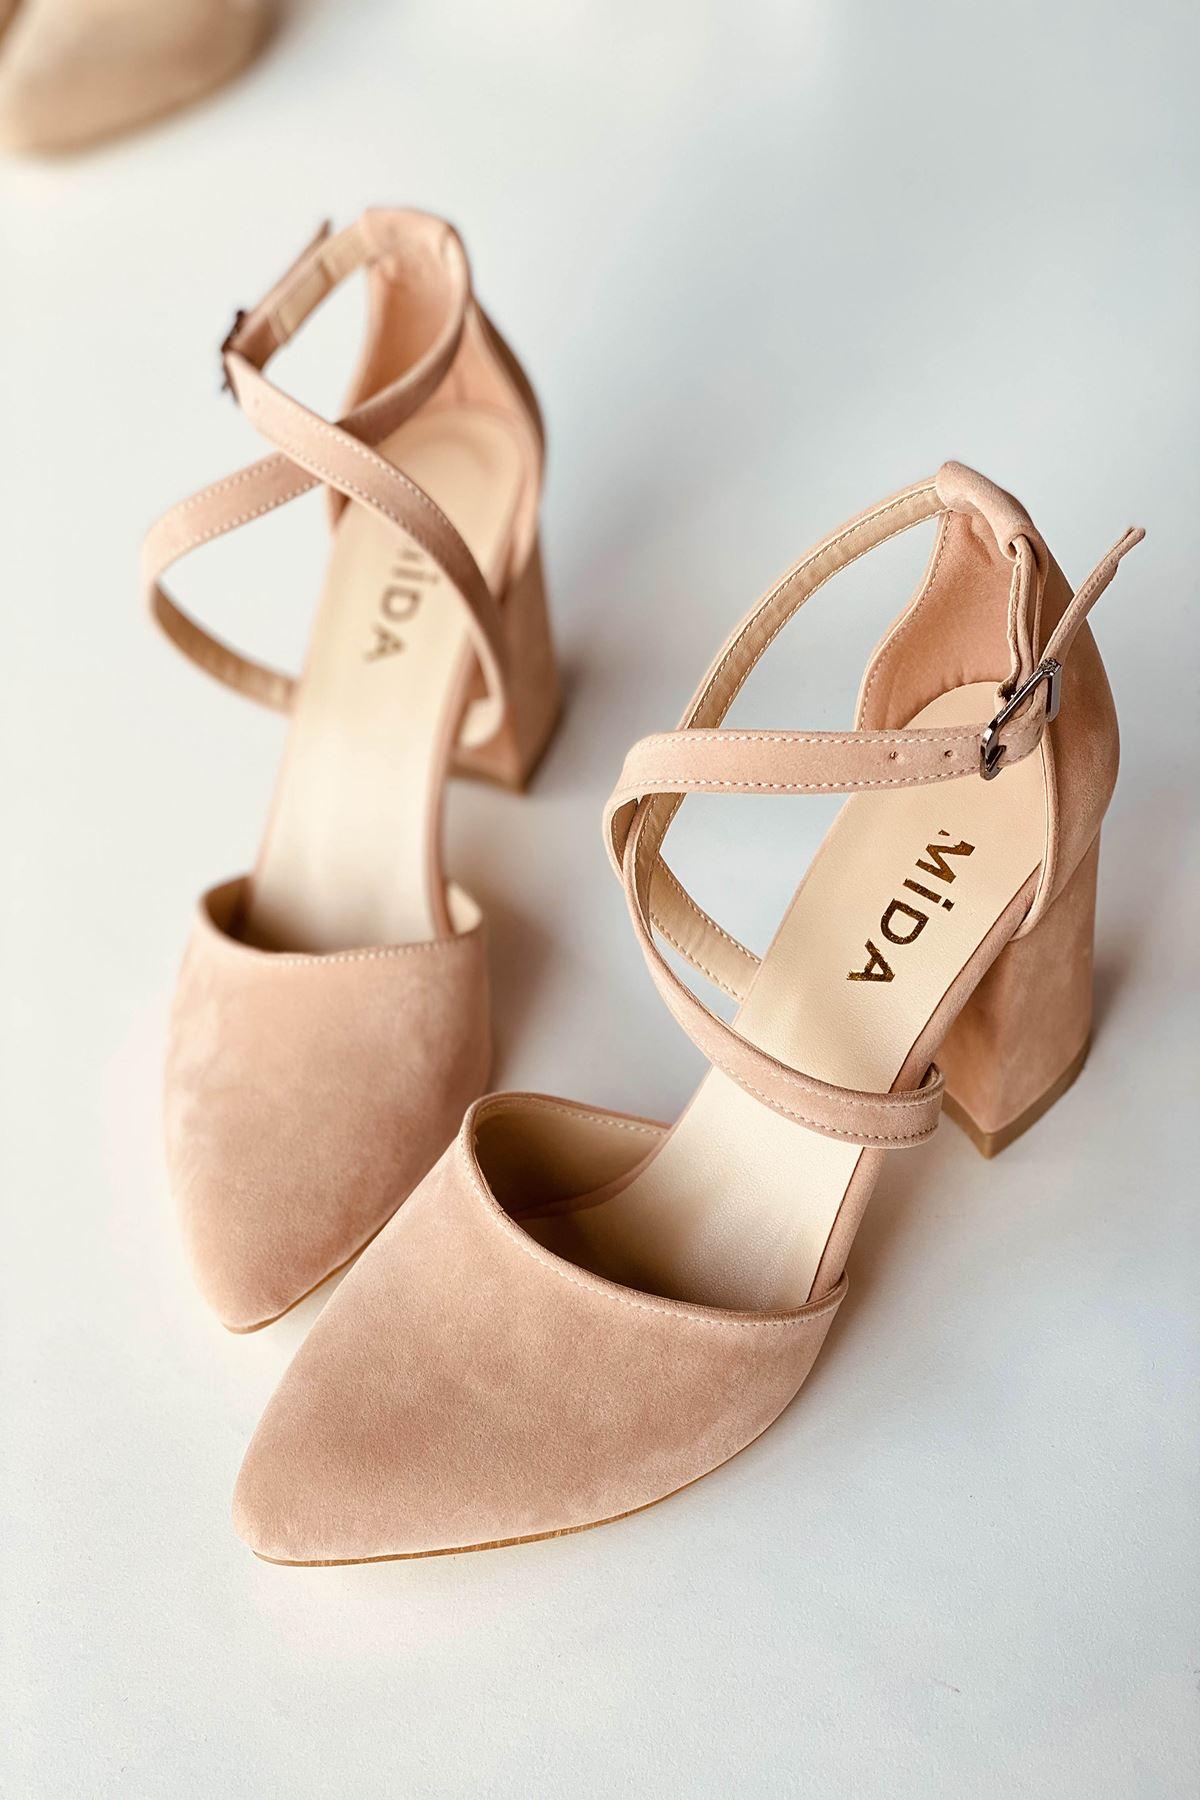 Y115 Pudra Süet Topuklu Ayakkabı